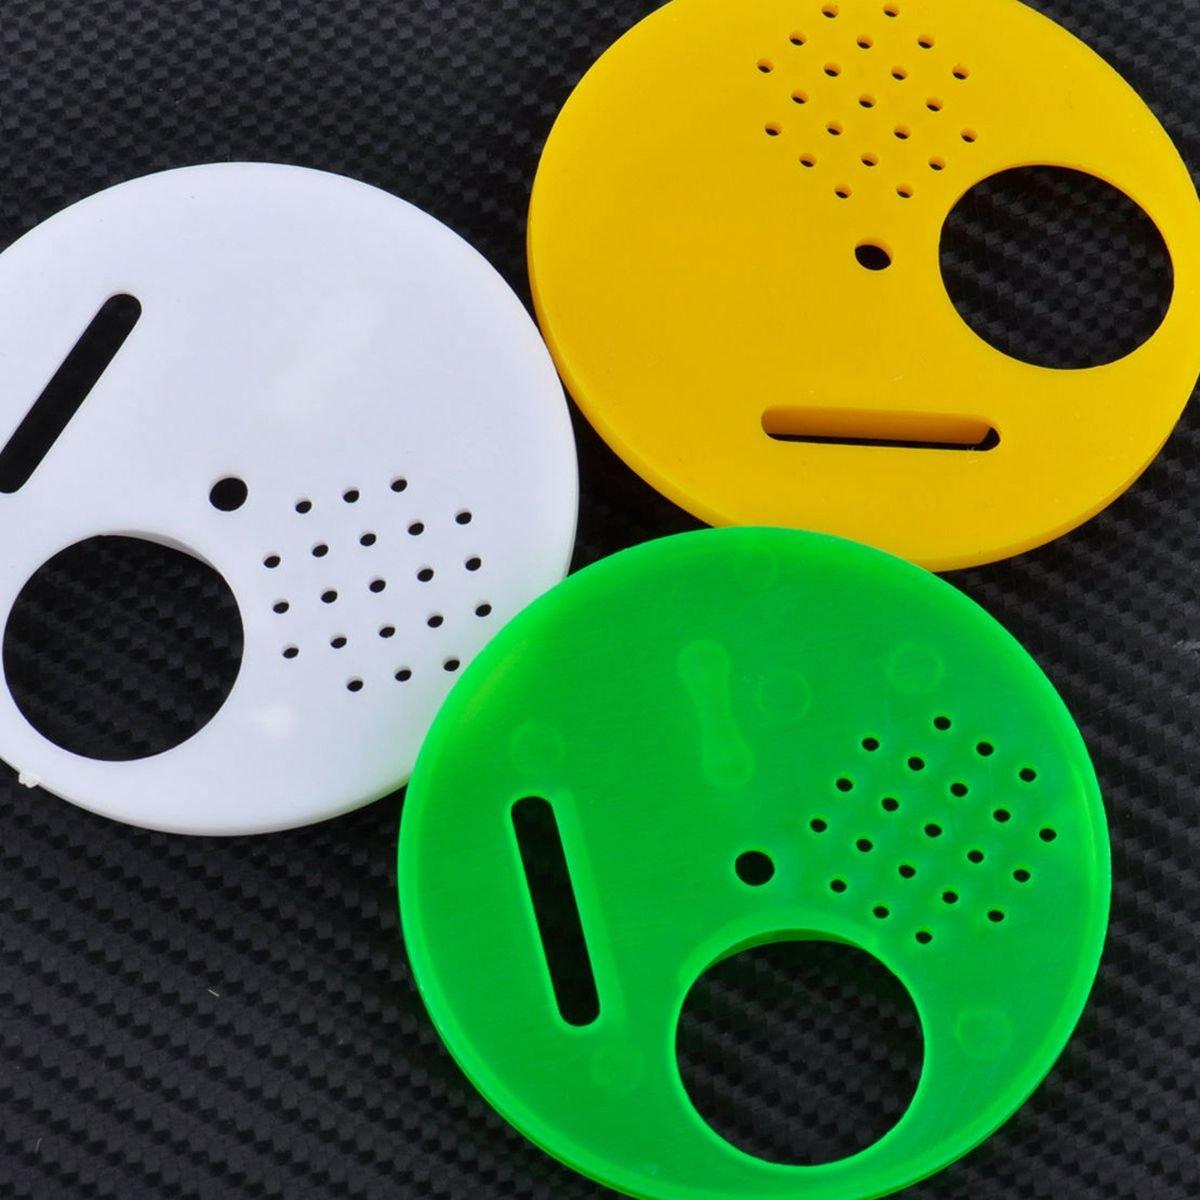 TOOGOO 12pcs 3 colores apicultores colmena caja entrada puertas 68mm herramientas apicultura equipo para la barra superior colmenas Nuc